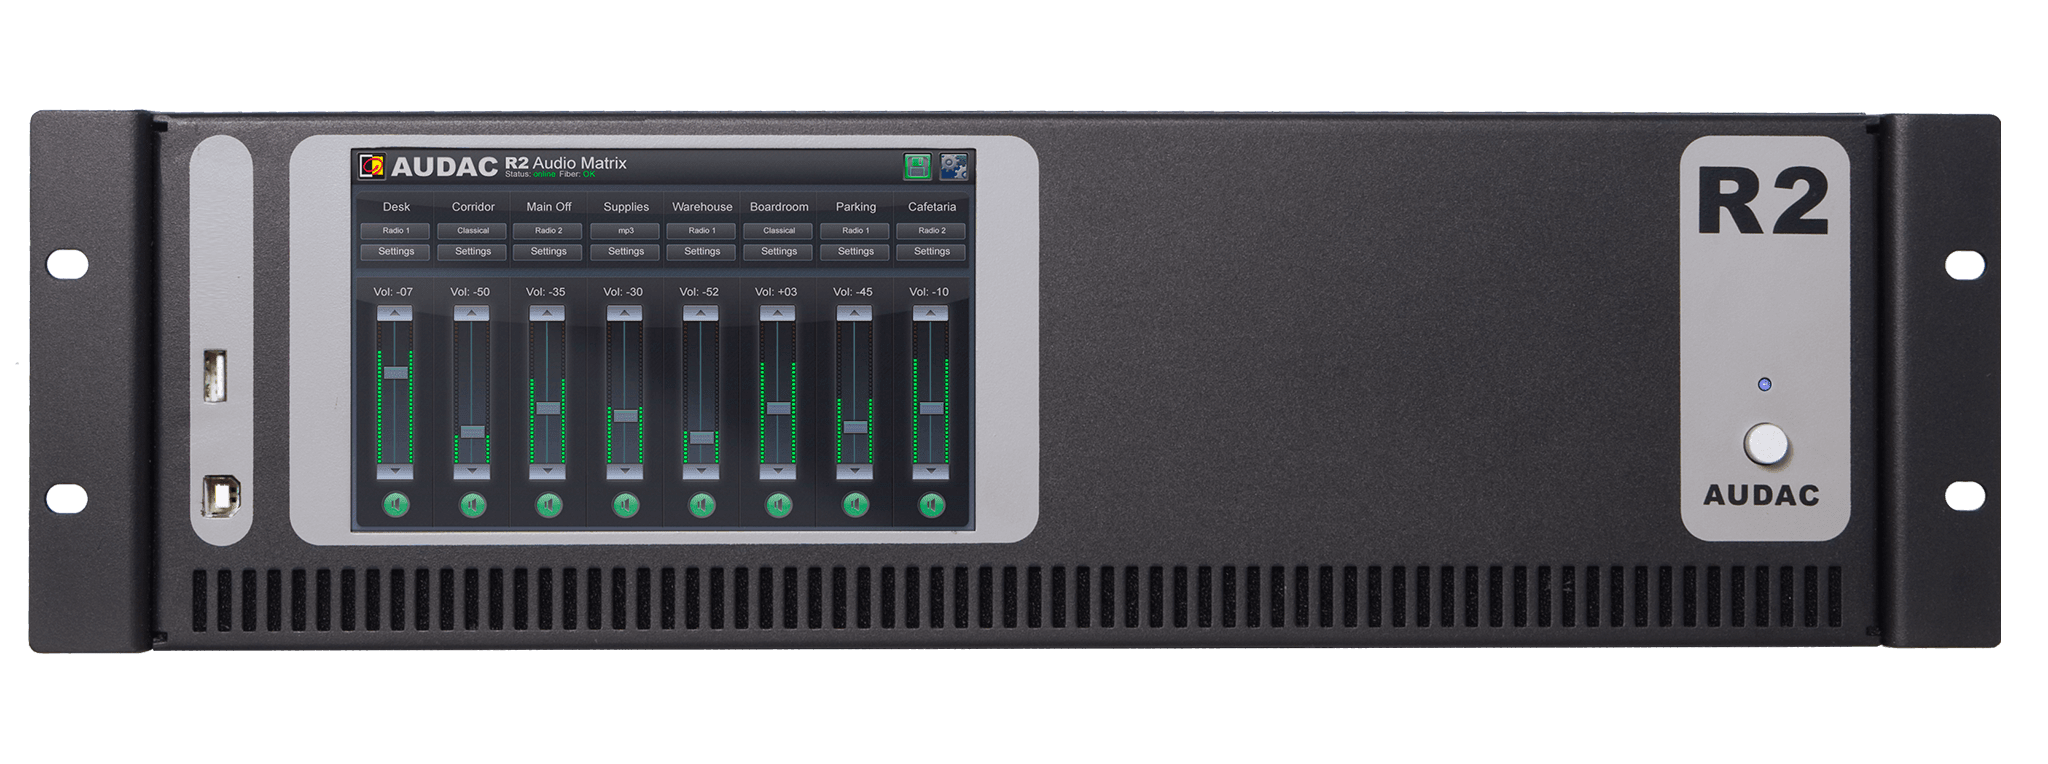 R2 - Multi-zone digital audio matrix